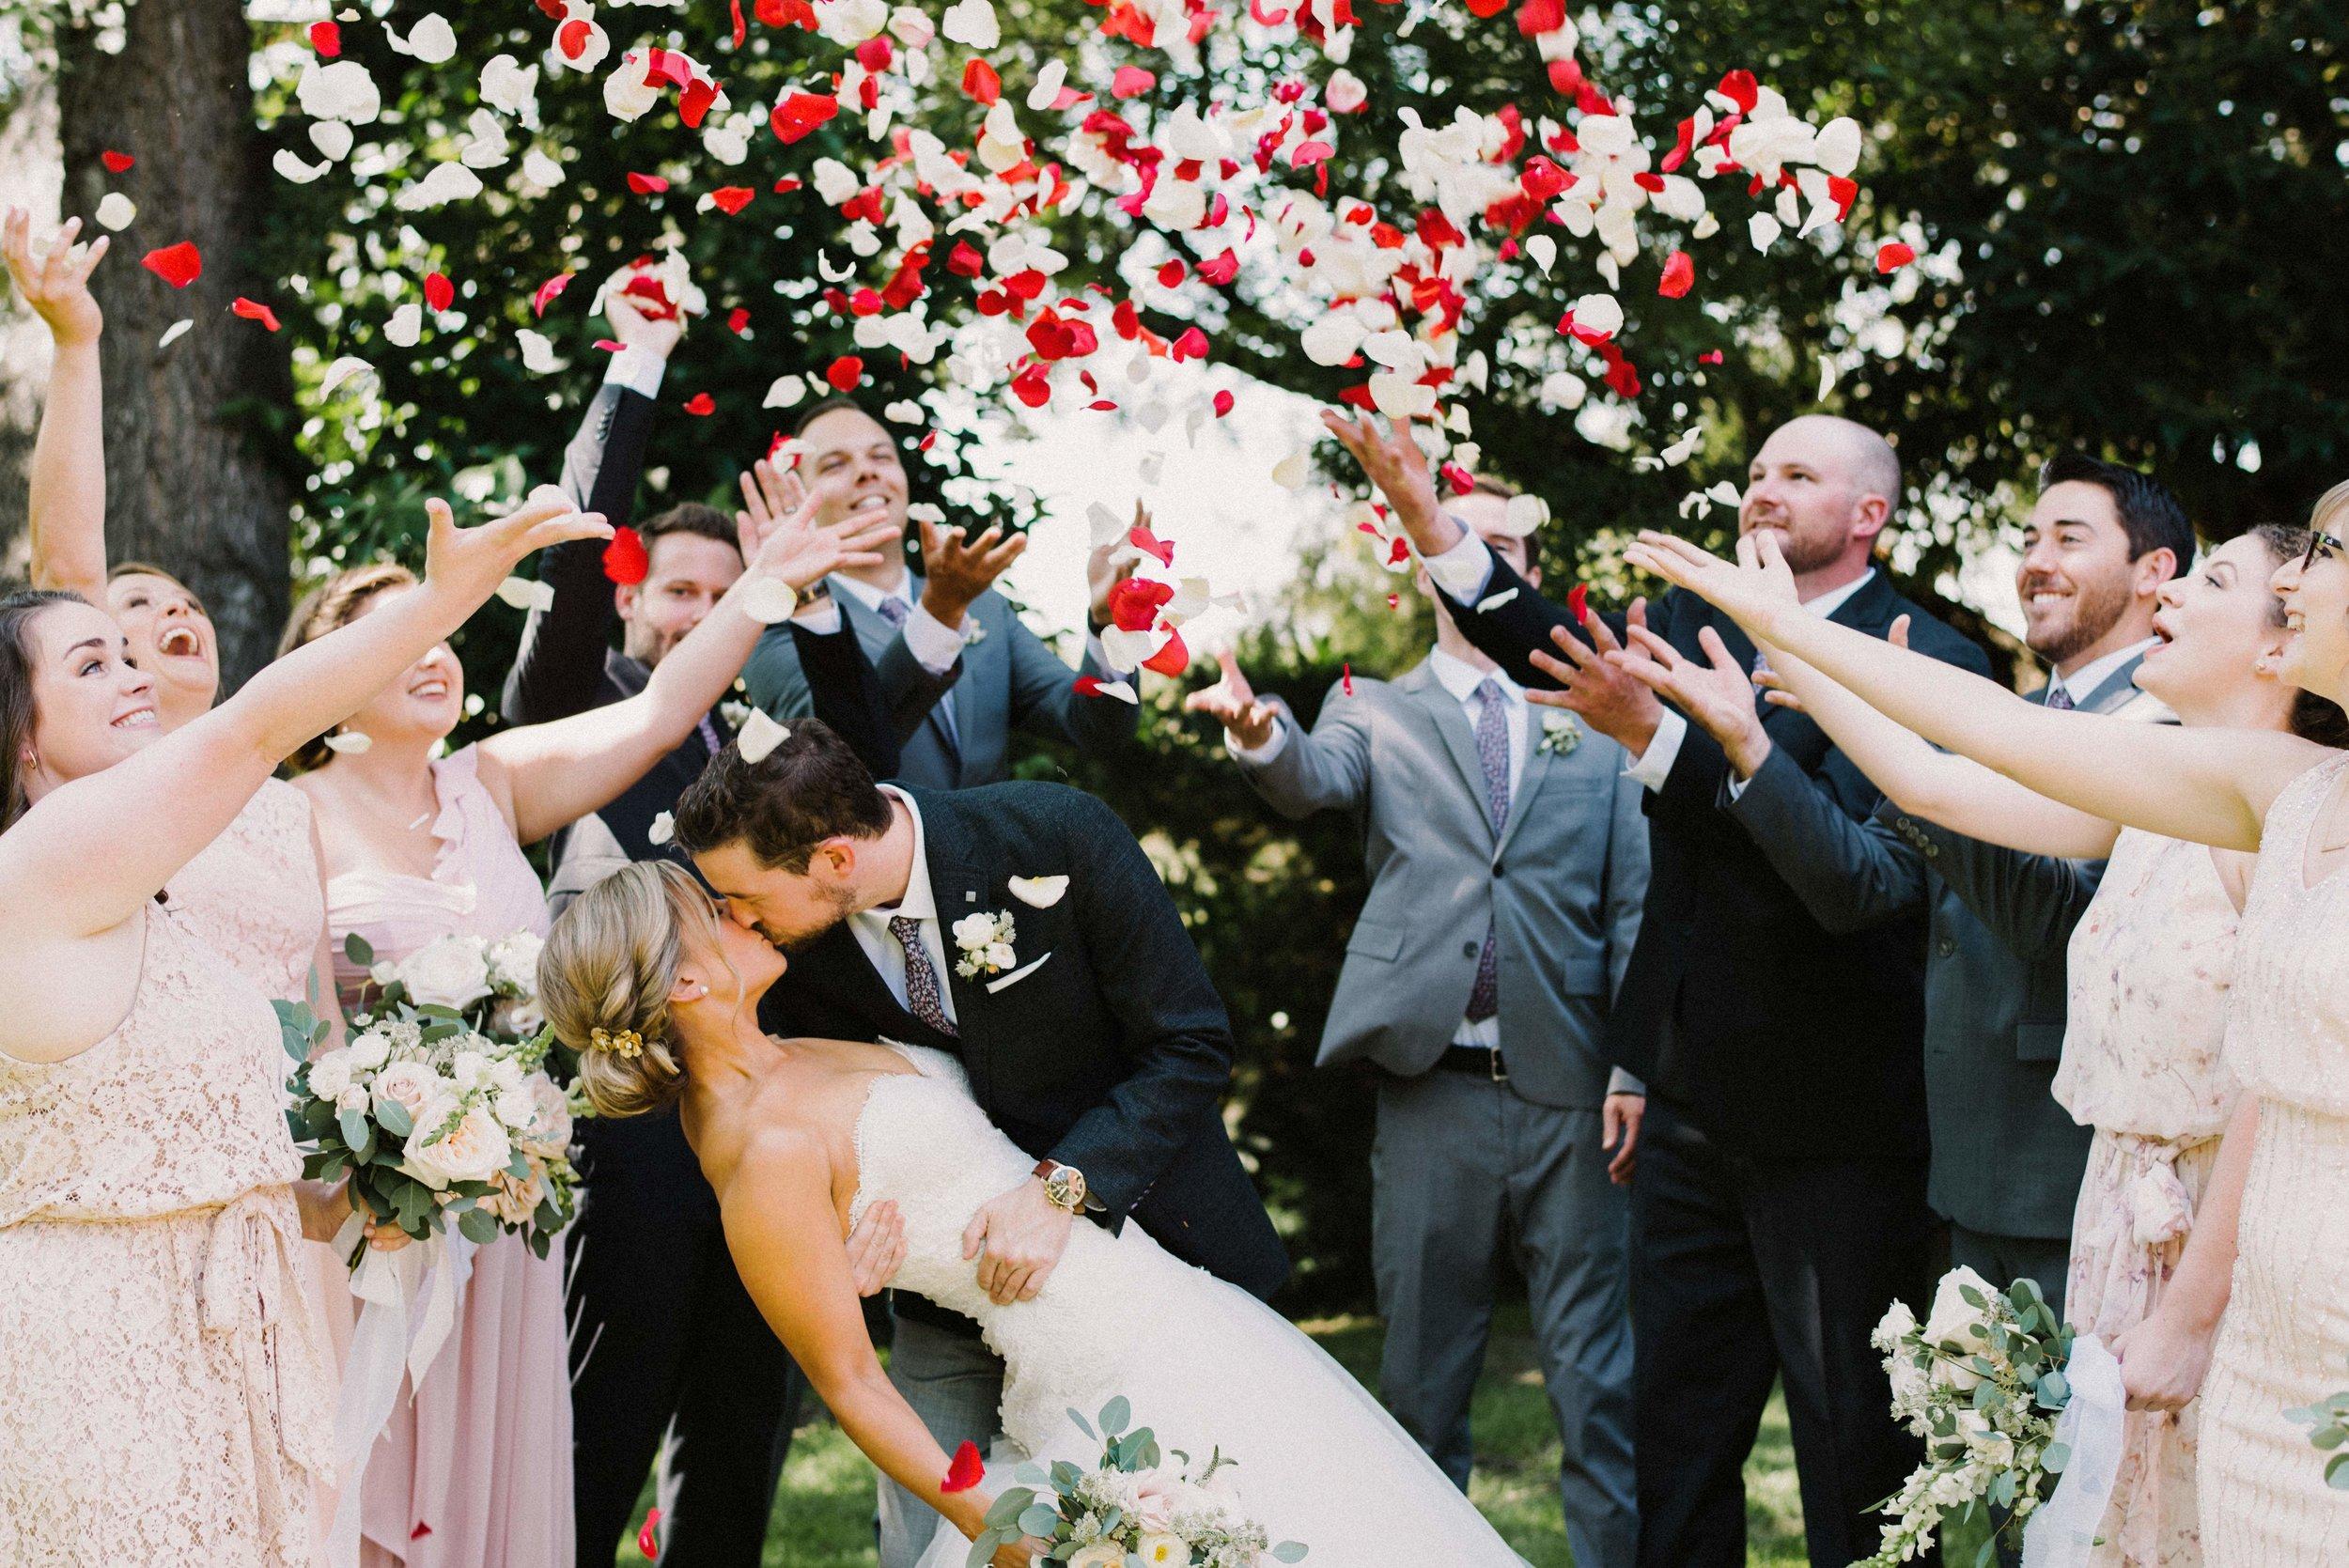 spreafico-farm-wedding-loveridge-photography-aurelia-flora0016.jpg